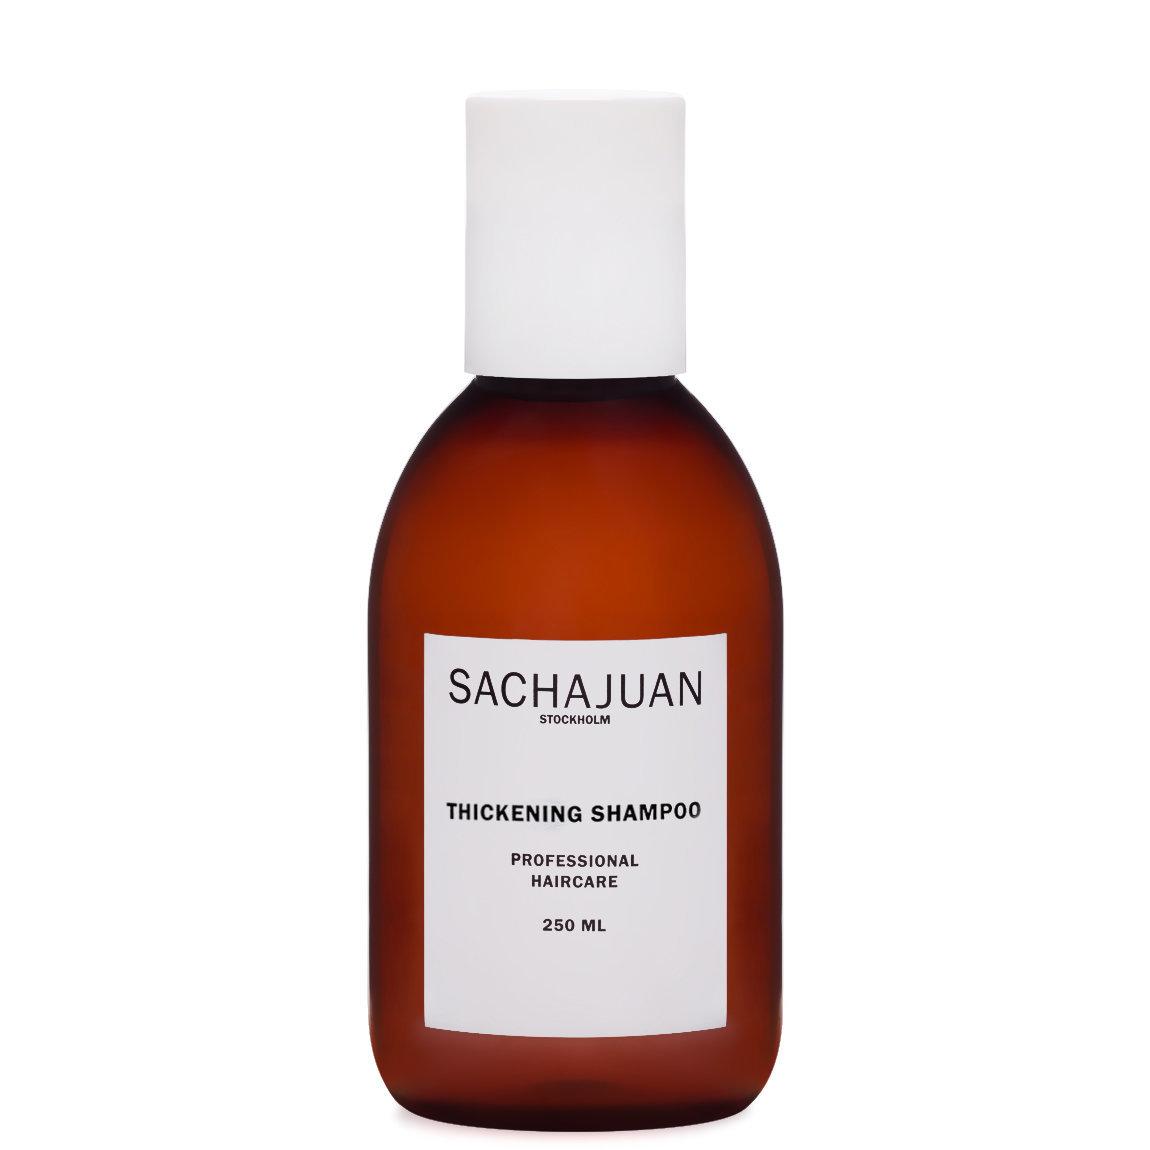 SACHAJUAN Thickening Shampoo product swatch.